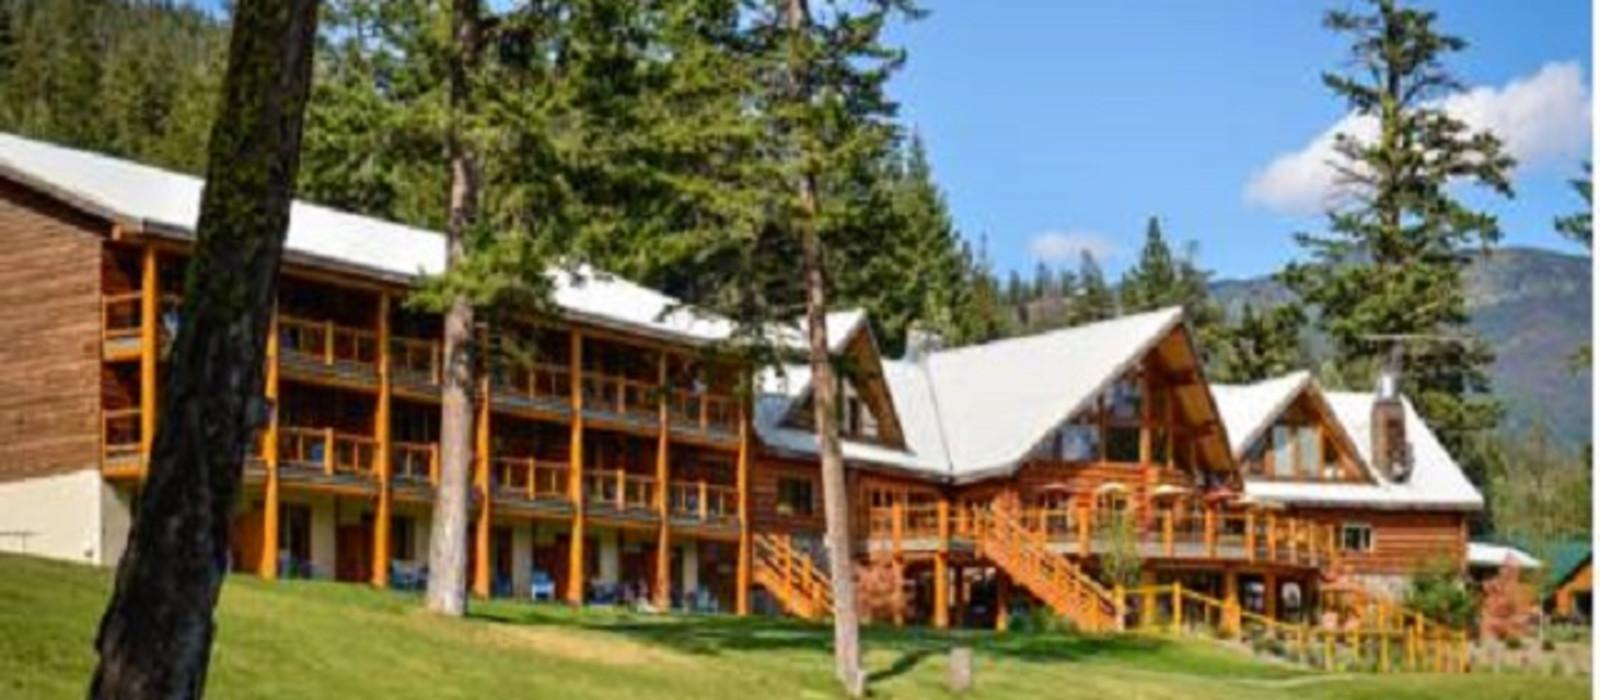 Hotel Tyax Wilderness Resort Canada